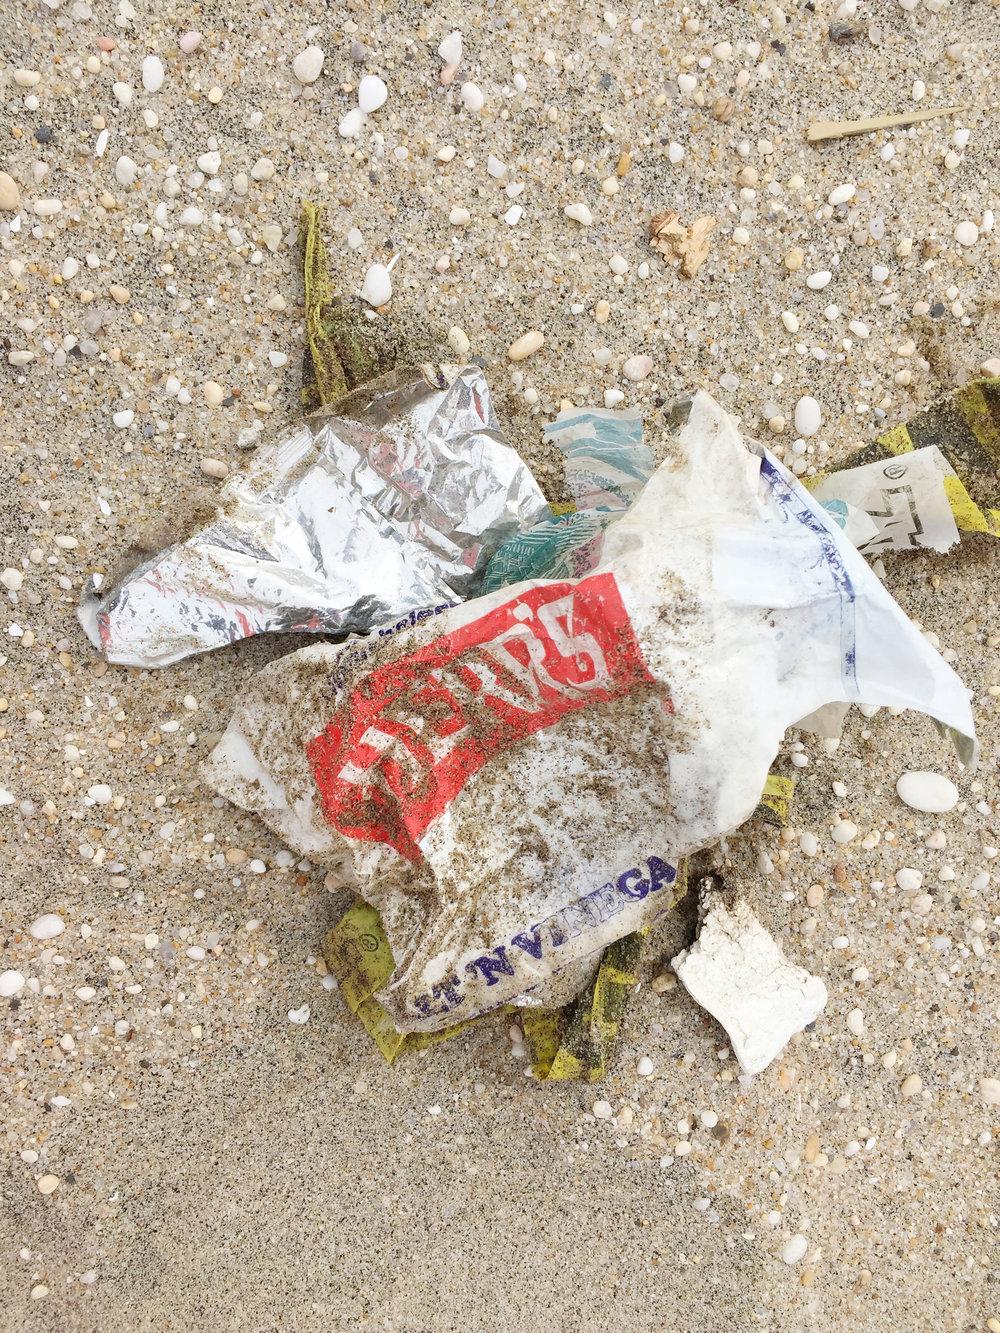 amy_chen_design_surfrider_asbury_park_new_jersey_beach_clean_plastic_food_packaging.JPG